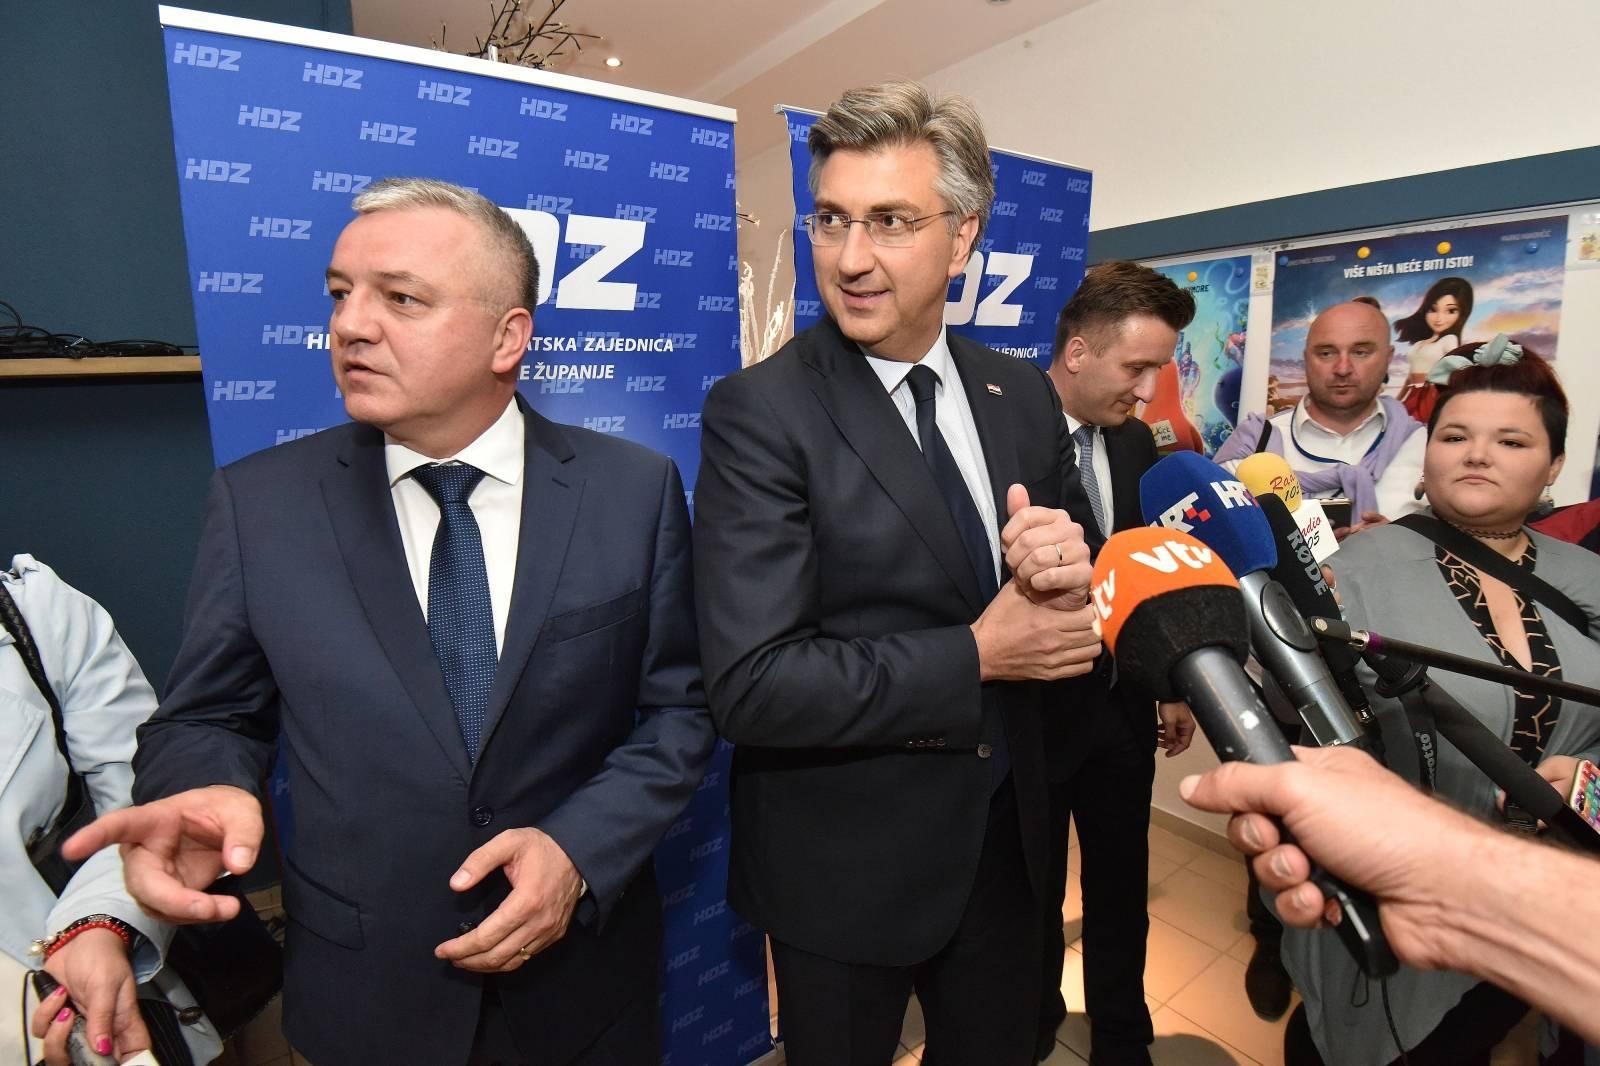 Predsjednik Vlade Andrej Plenković sudjelovao na sjednici HDZ-a Međimurske županije